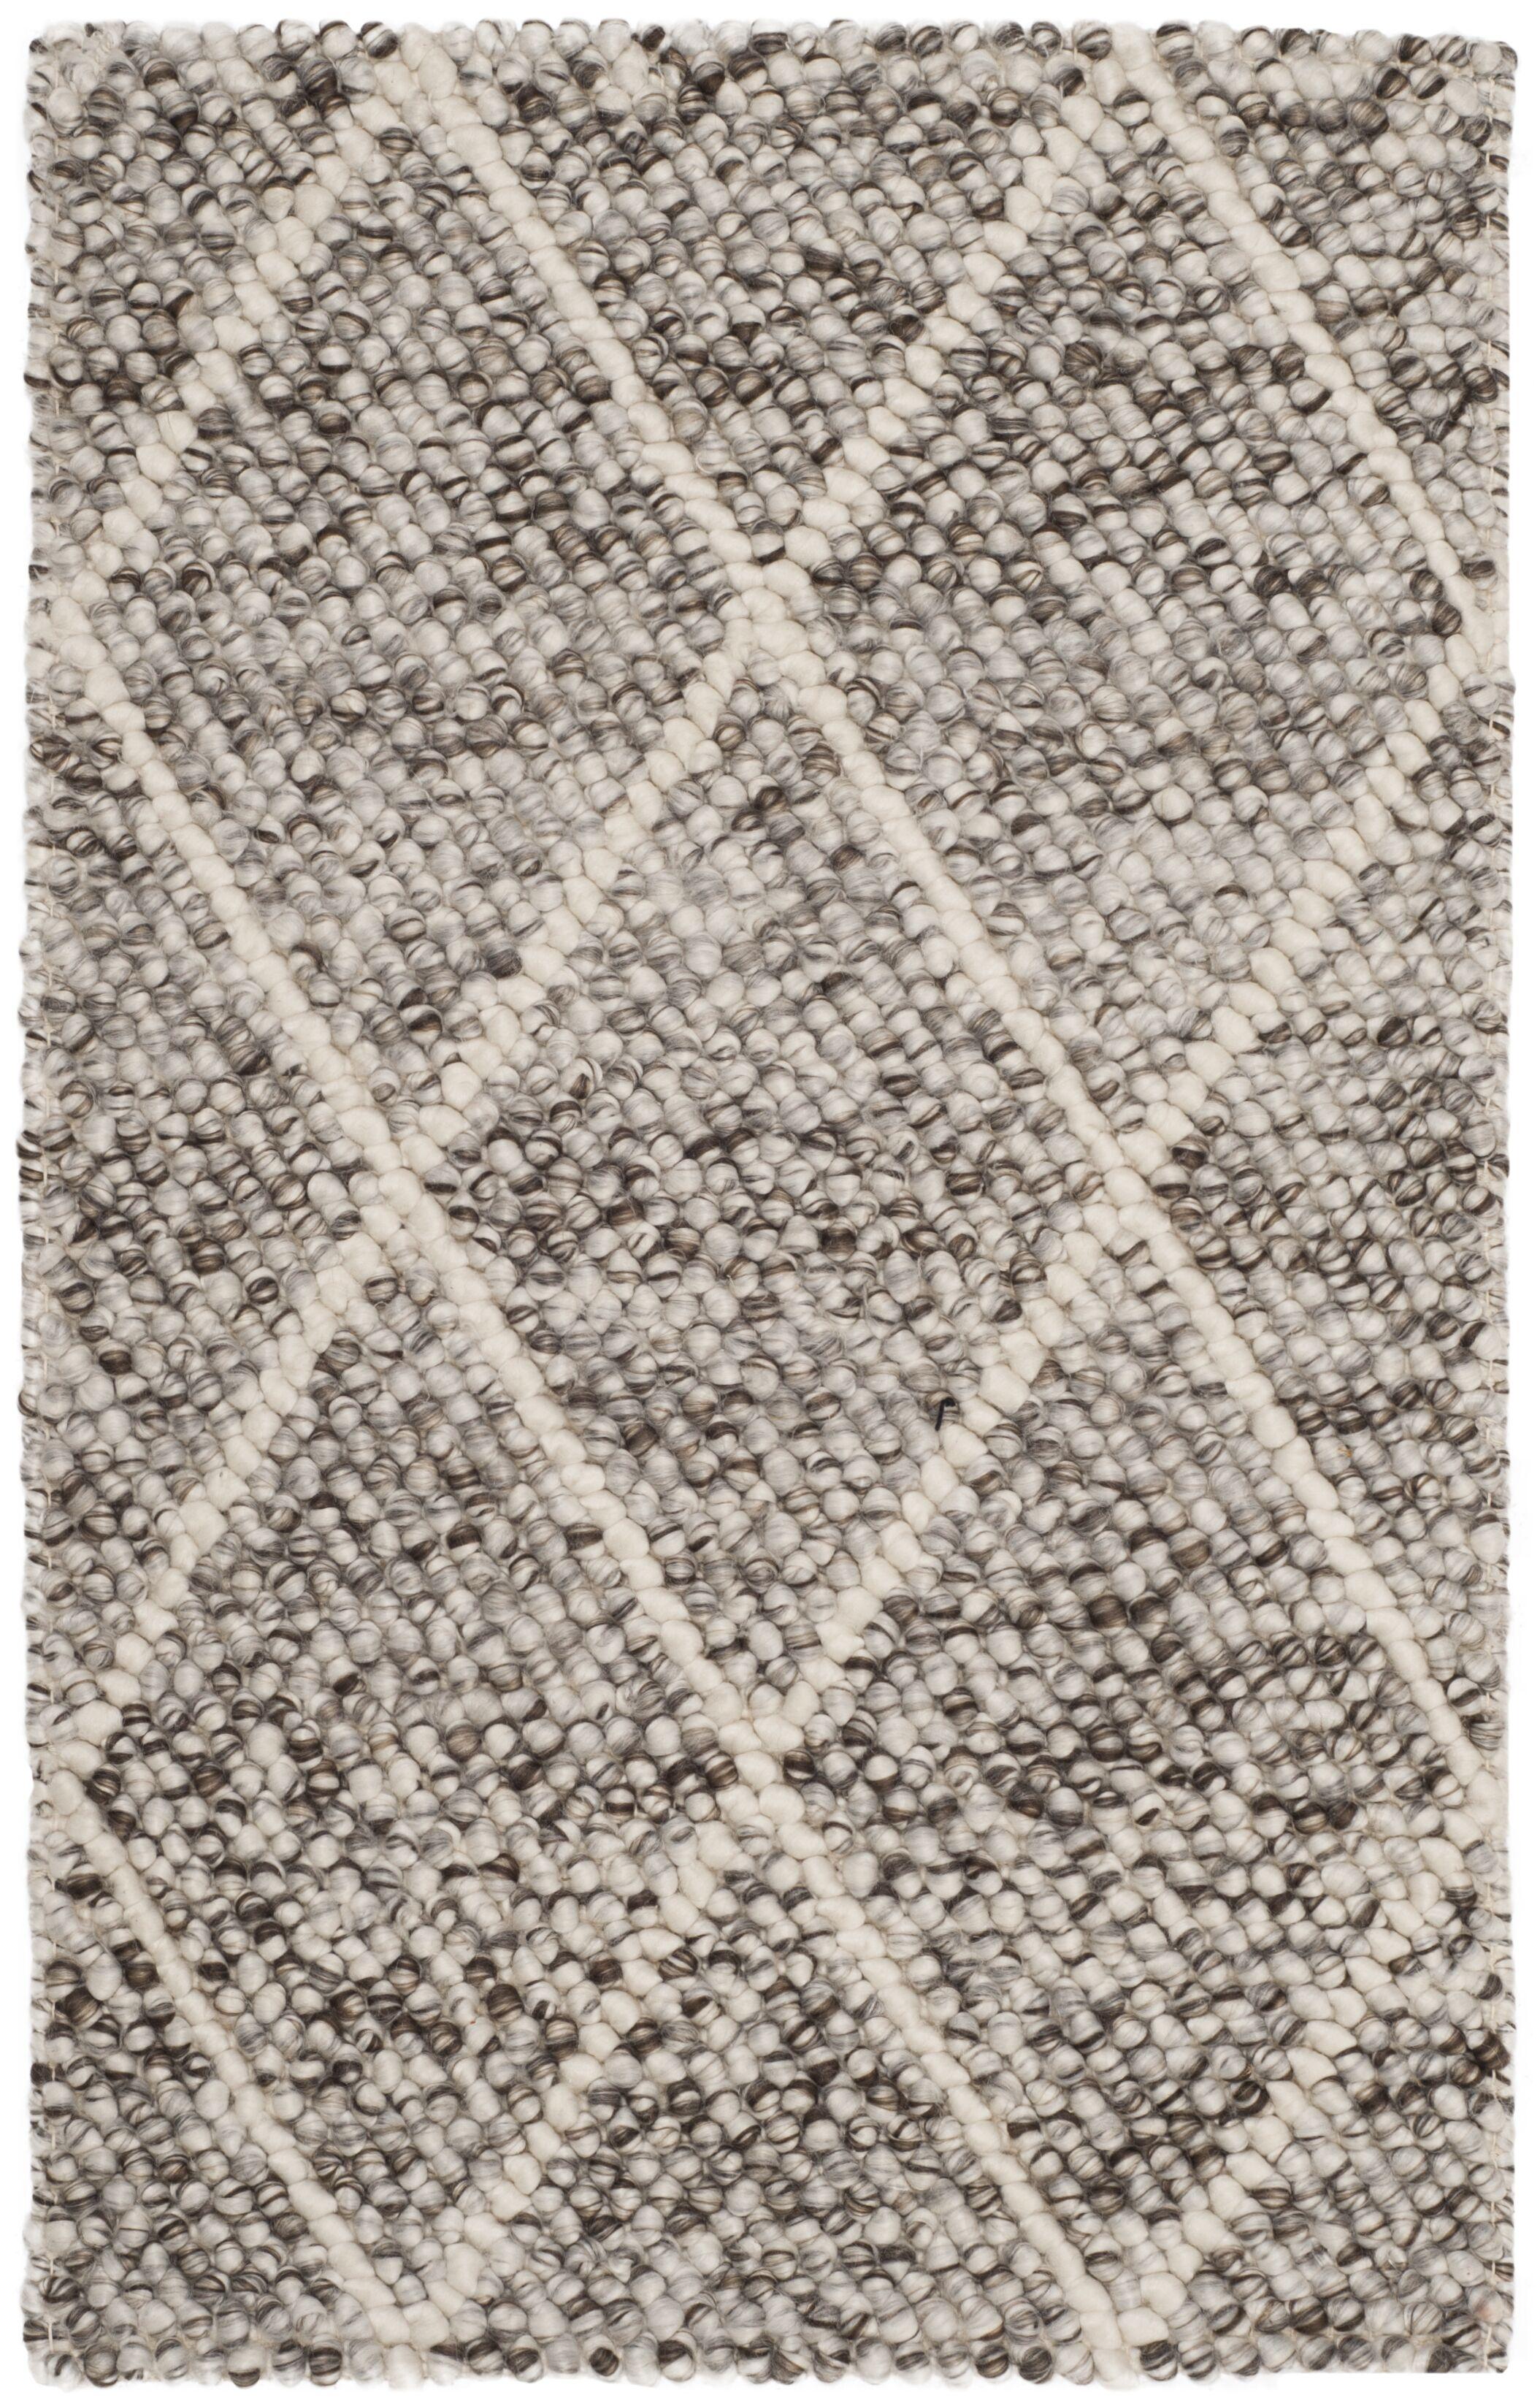 Billie Hand-Tufted Ivory/Stone Area Rug Rug Size: Round 6'